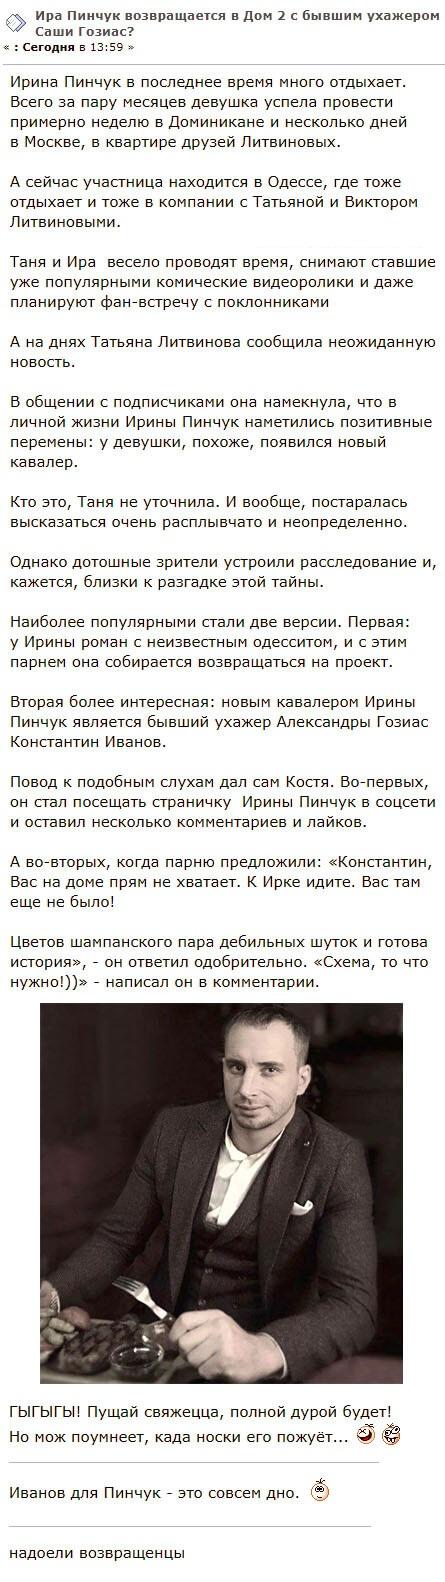 Константин Иванов намерен прийти на проект к Ирине Пинчук